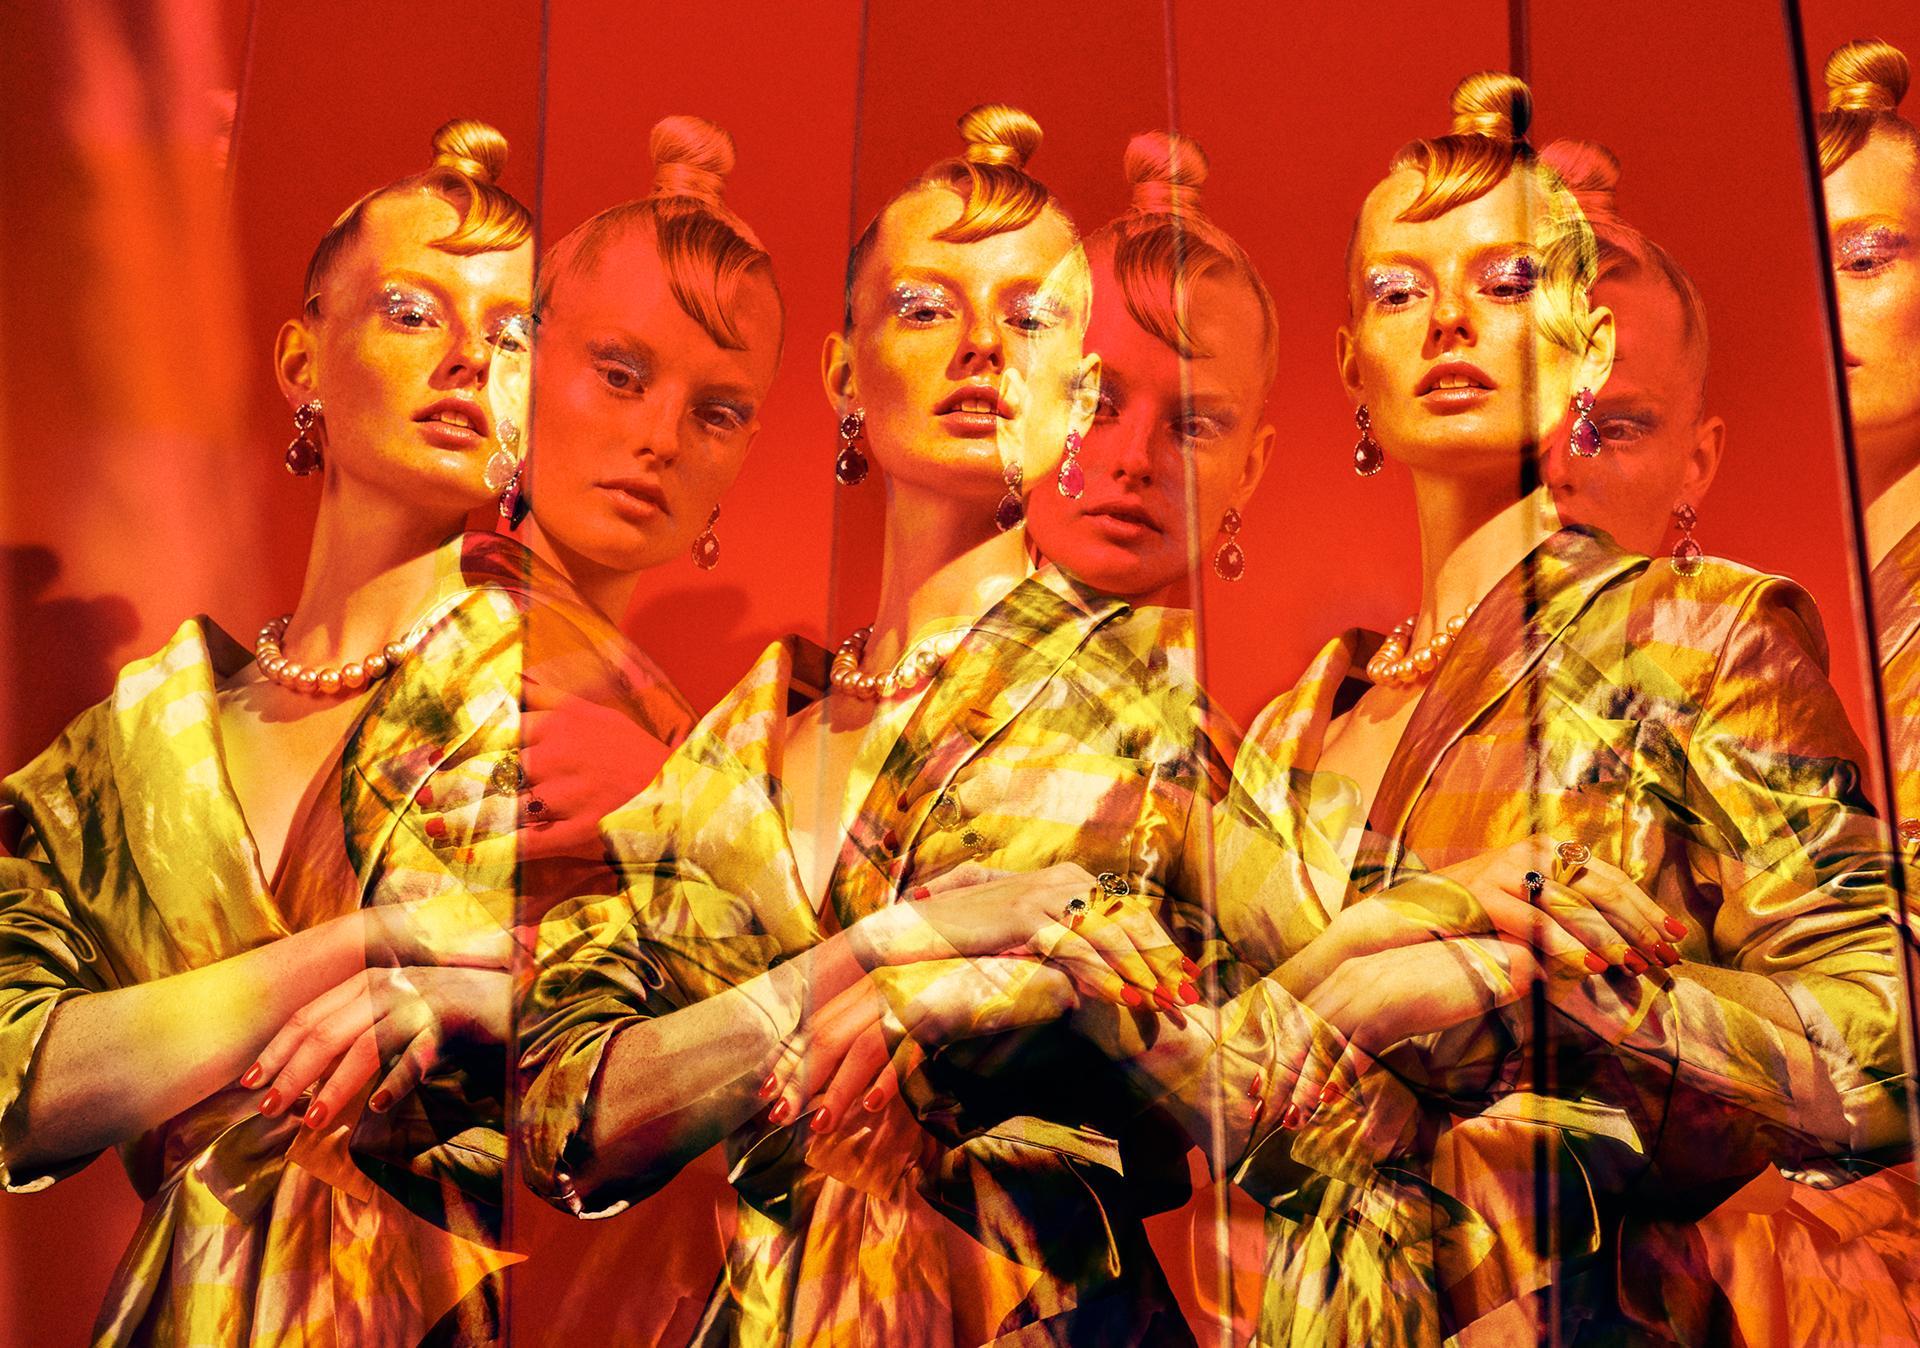 My reflection for GALA Germany / Елизавета Породина Elizaveta Porodina